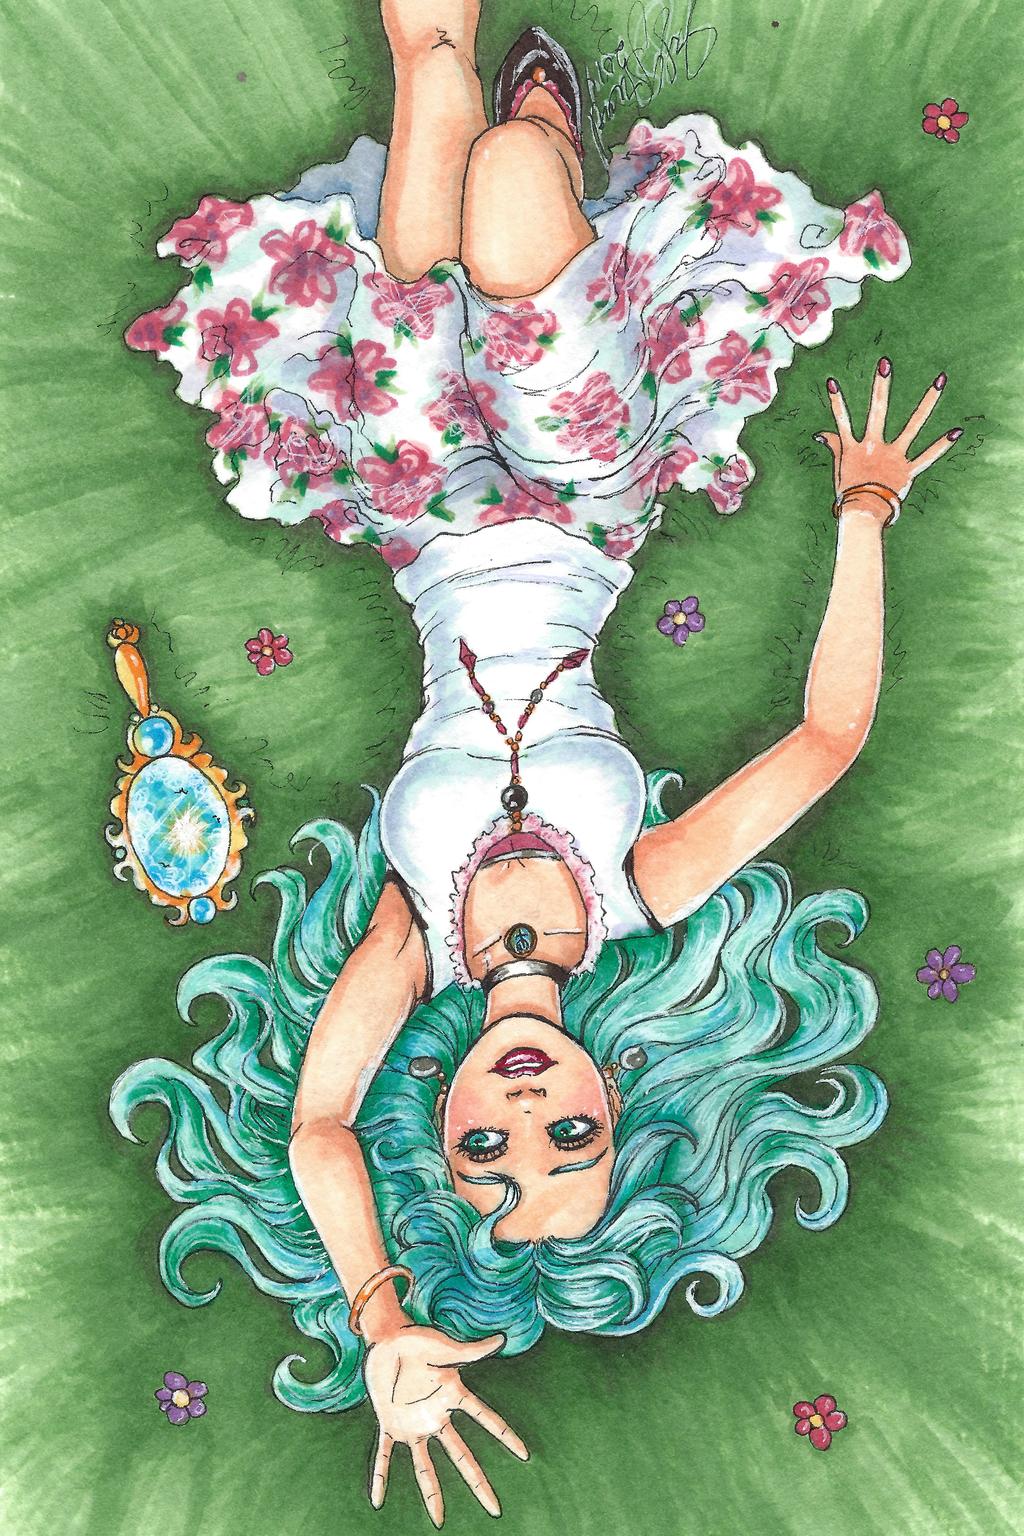 MM: Neptune's Reach by Miserie